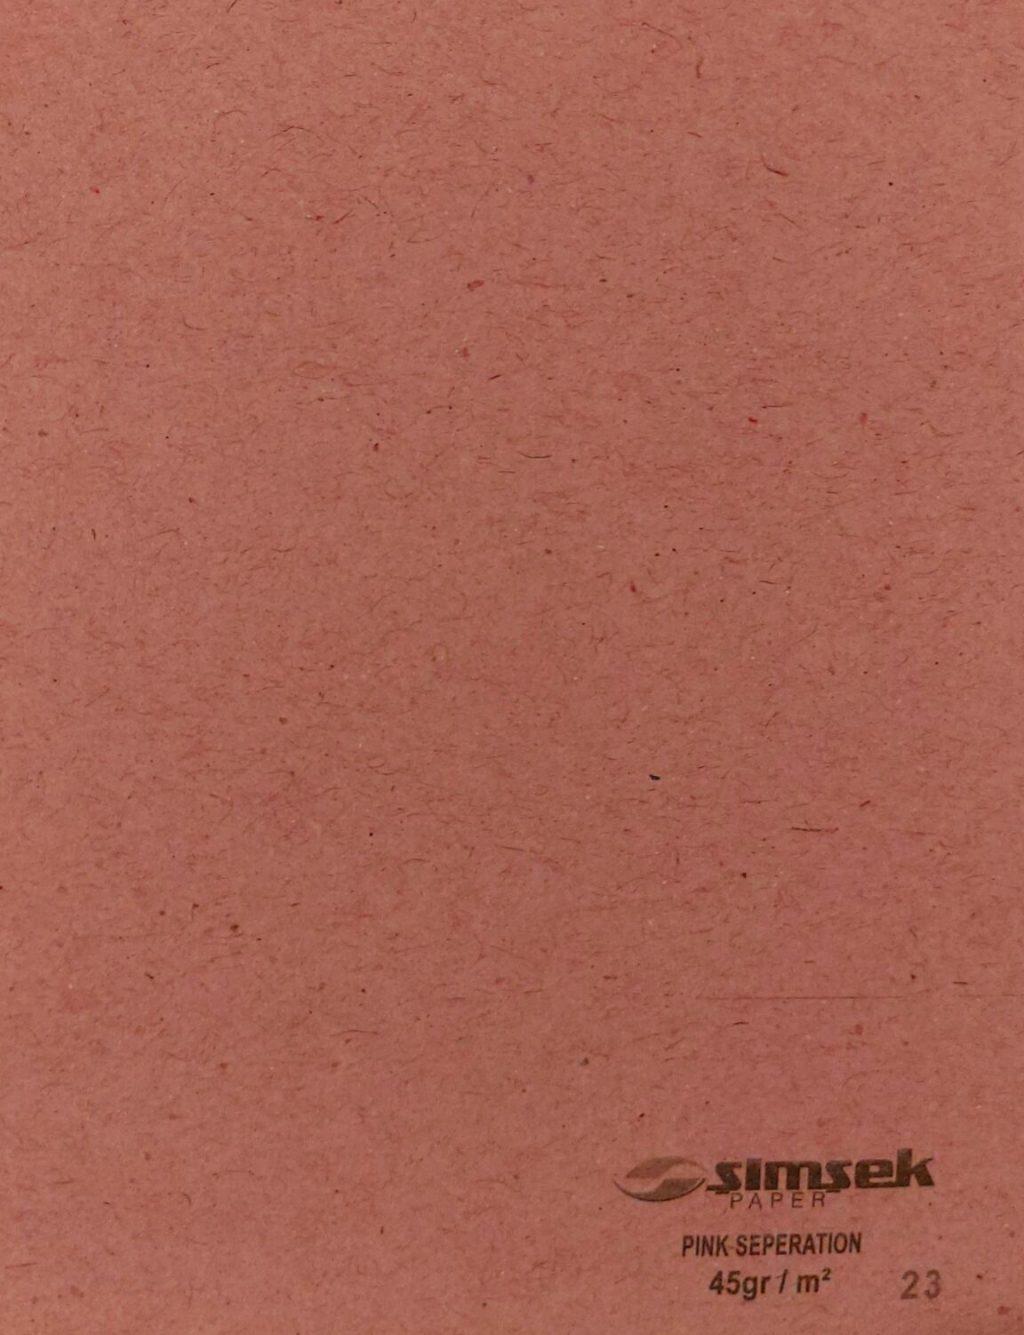 Pink-Seperation-45gr-m²